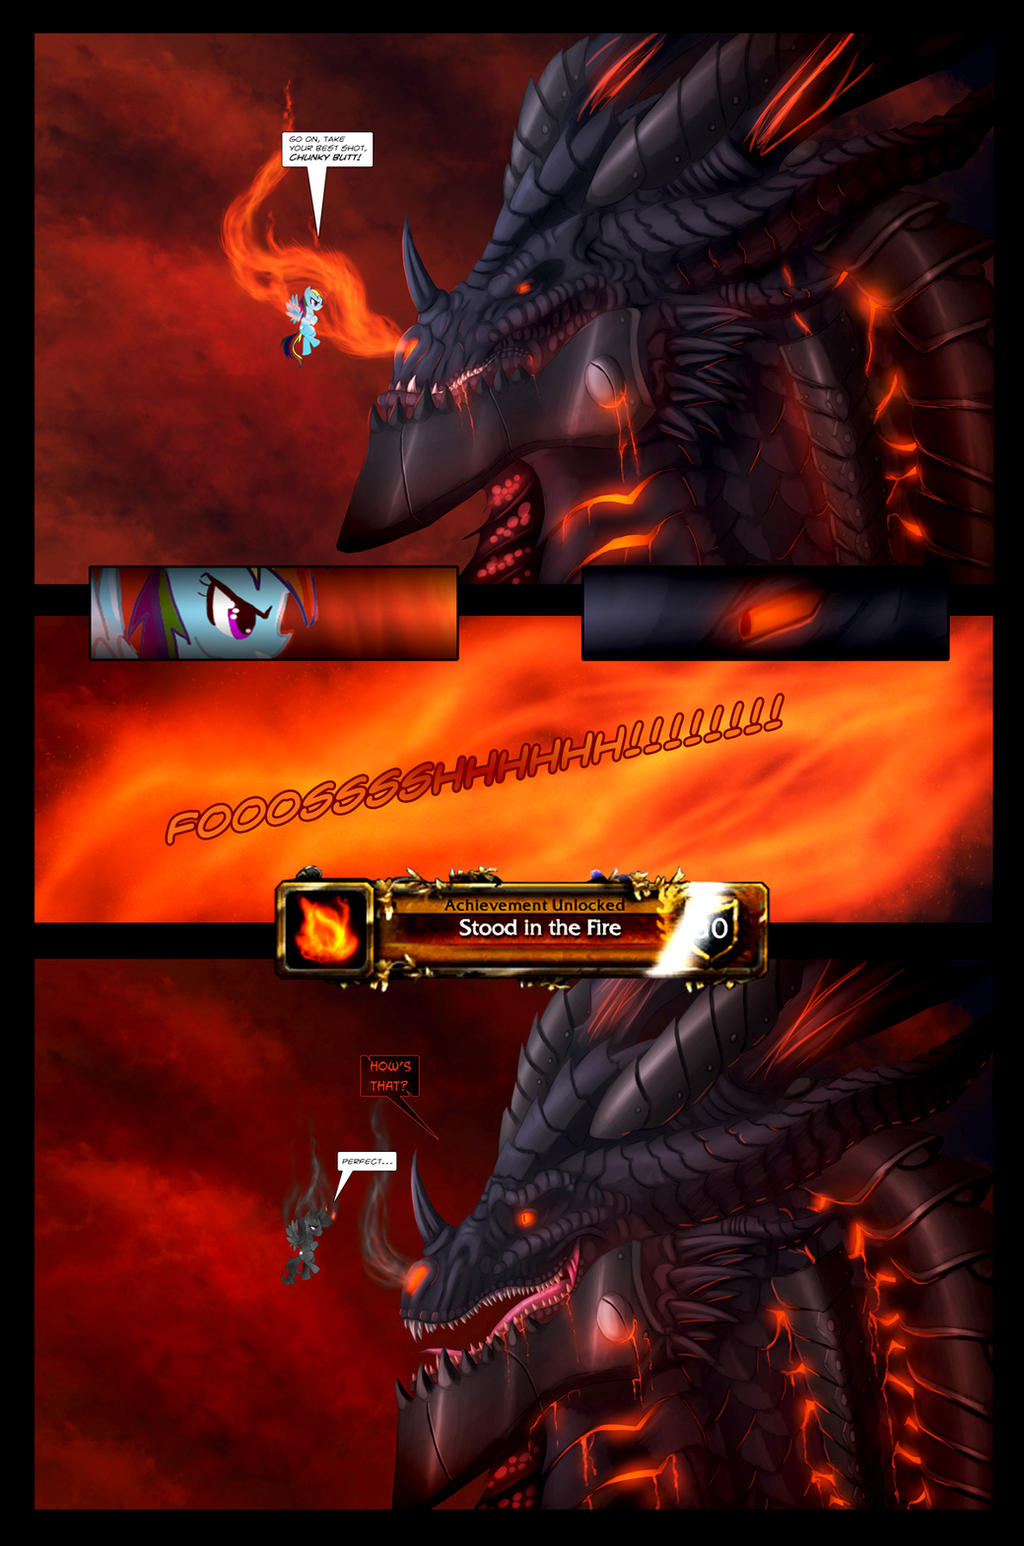 Rainbowdash Stands in the Fire by Ghostwalker2061